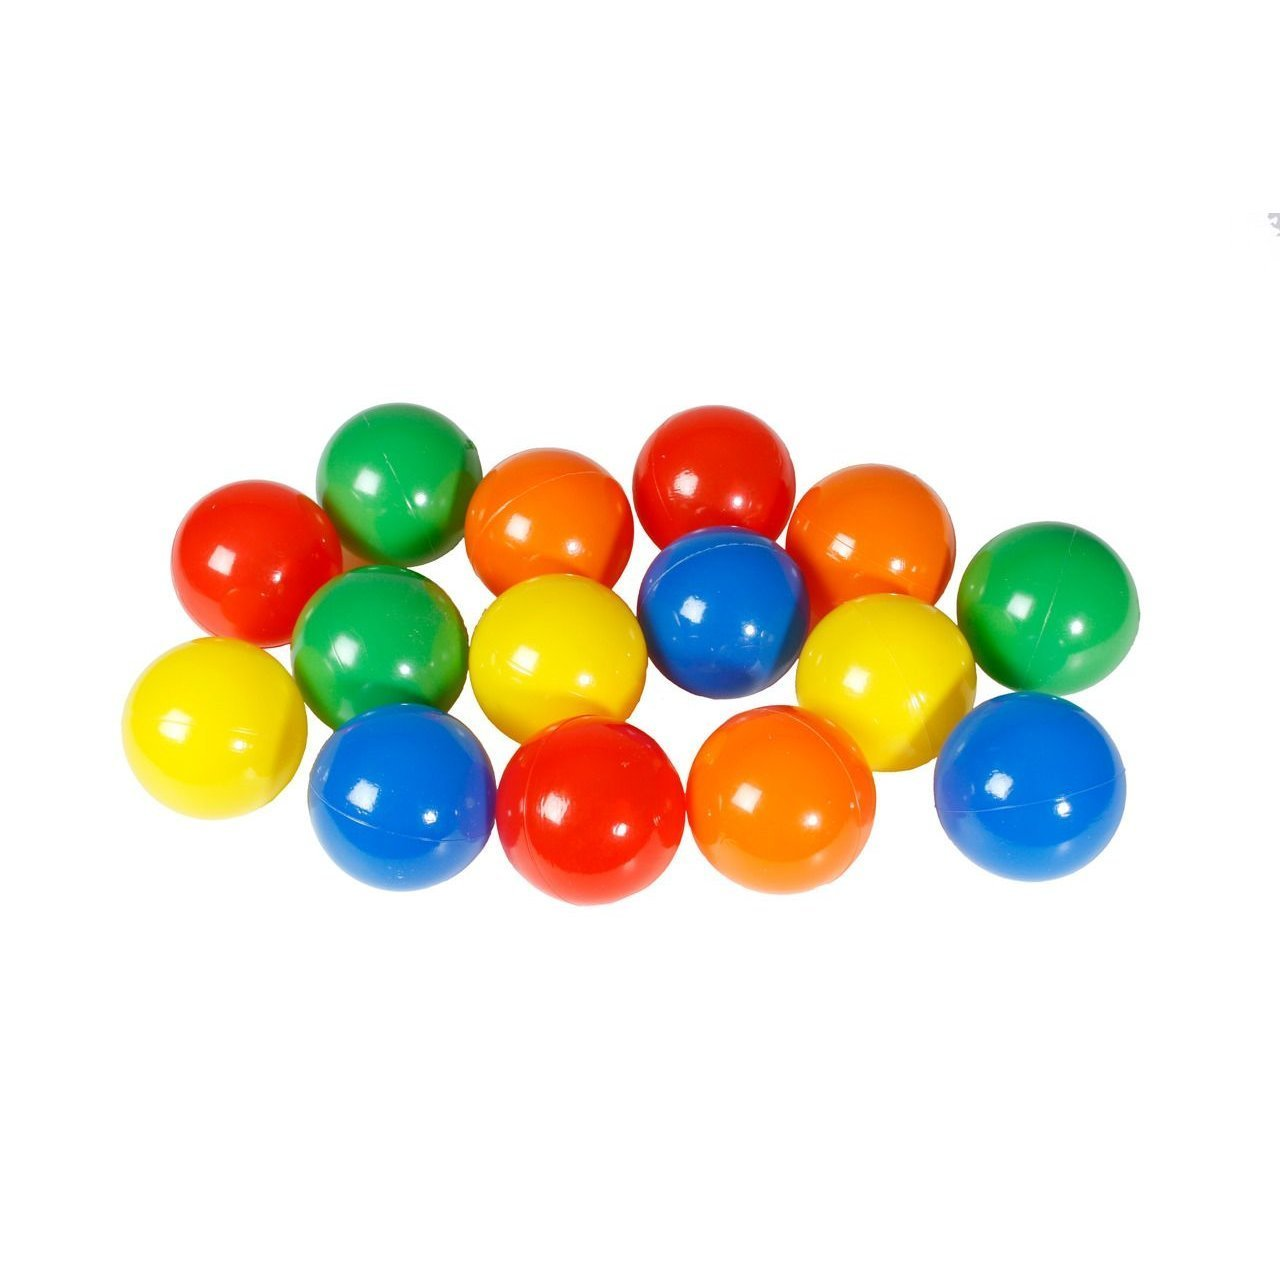 Karlie Bällebad Bälle für Hundepool Doggy Pool, 250 Stk, farblich sortiert